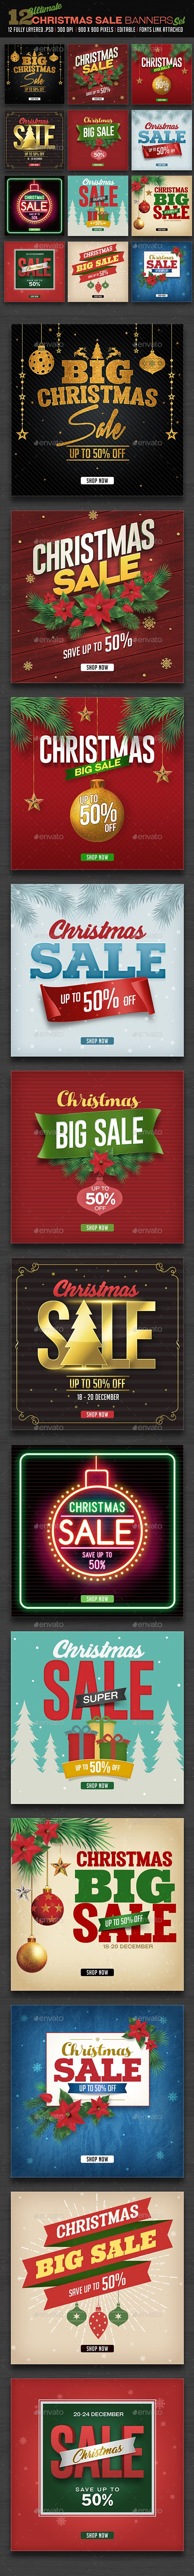 12 Christmas Sale Banners Set - Templates PSD